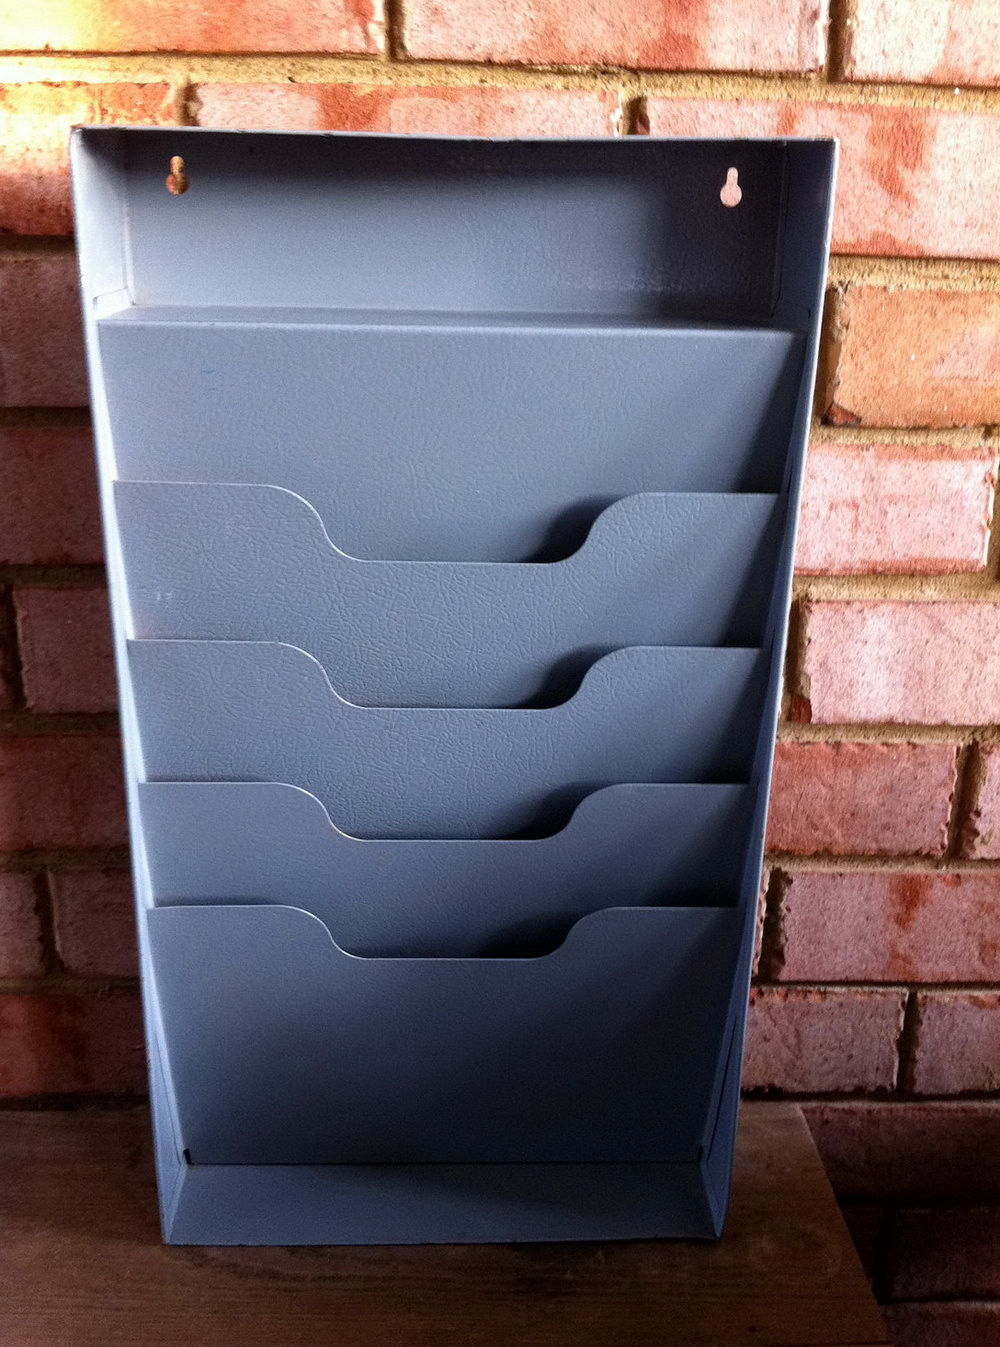 Best ideas about DIY Hanging File Organizer . Save or Pin Hanging Pocket File Organizer Now.